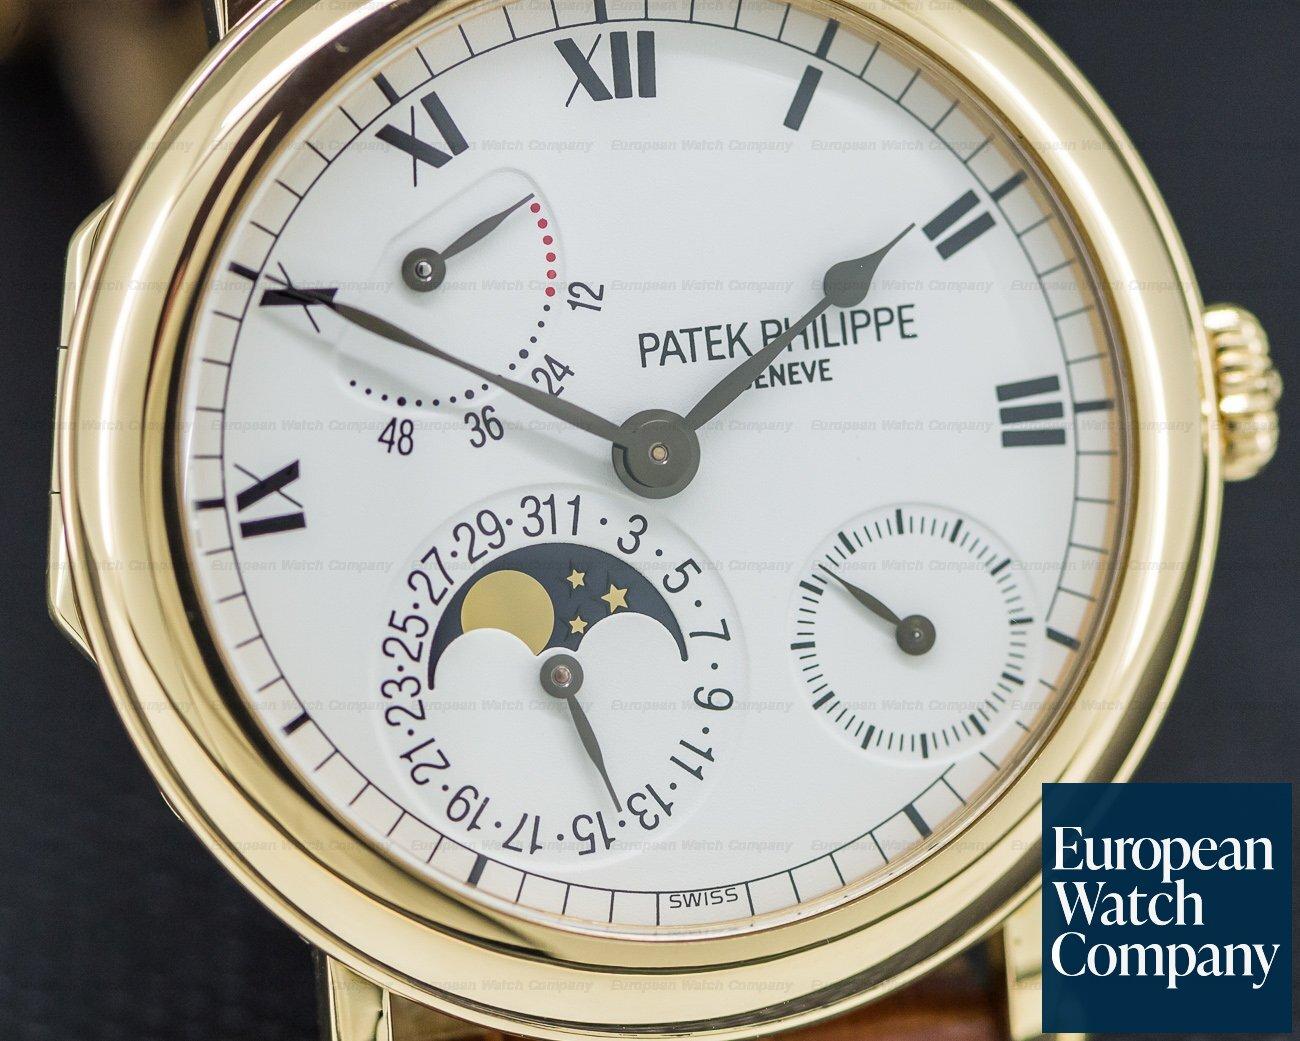 Patek Philippe 5054J-001 Power Reserve Moonphase 18K Yellow Gold